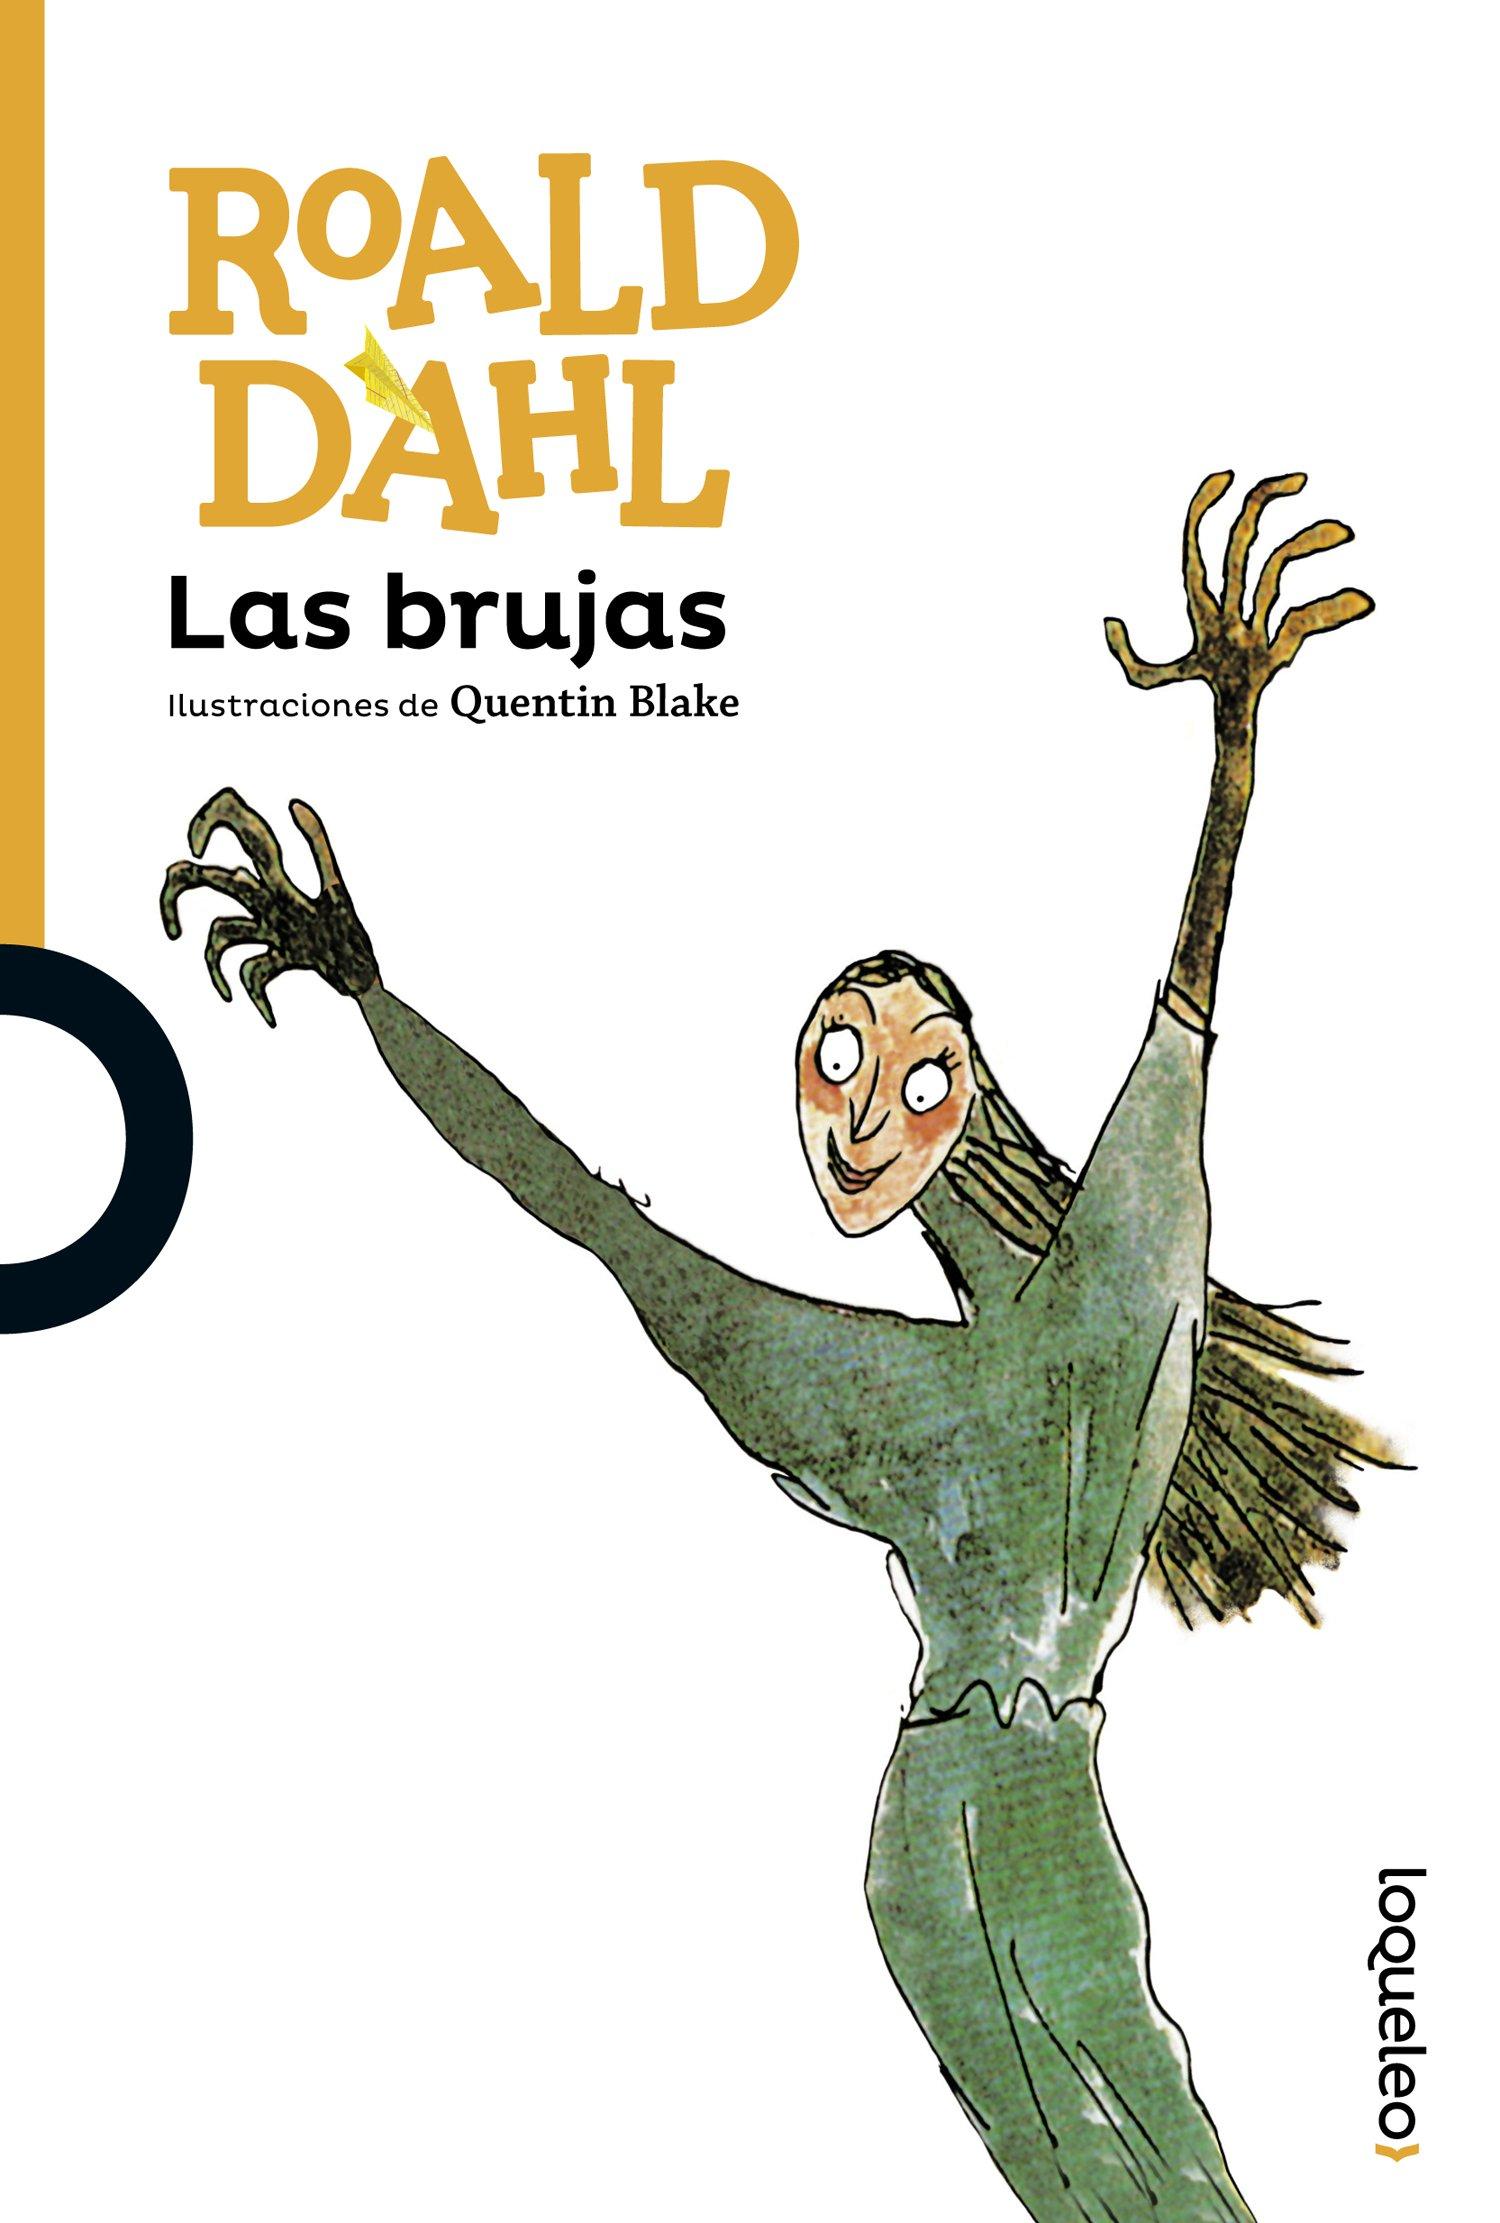 Las brujas: Amazon.es: Dahl, Roald, Blake, Quentin, Juan Gruyat ...